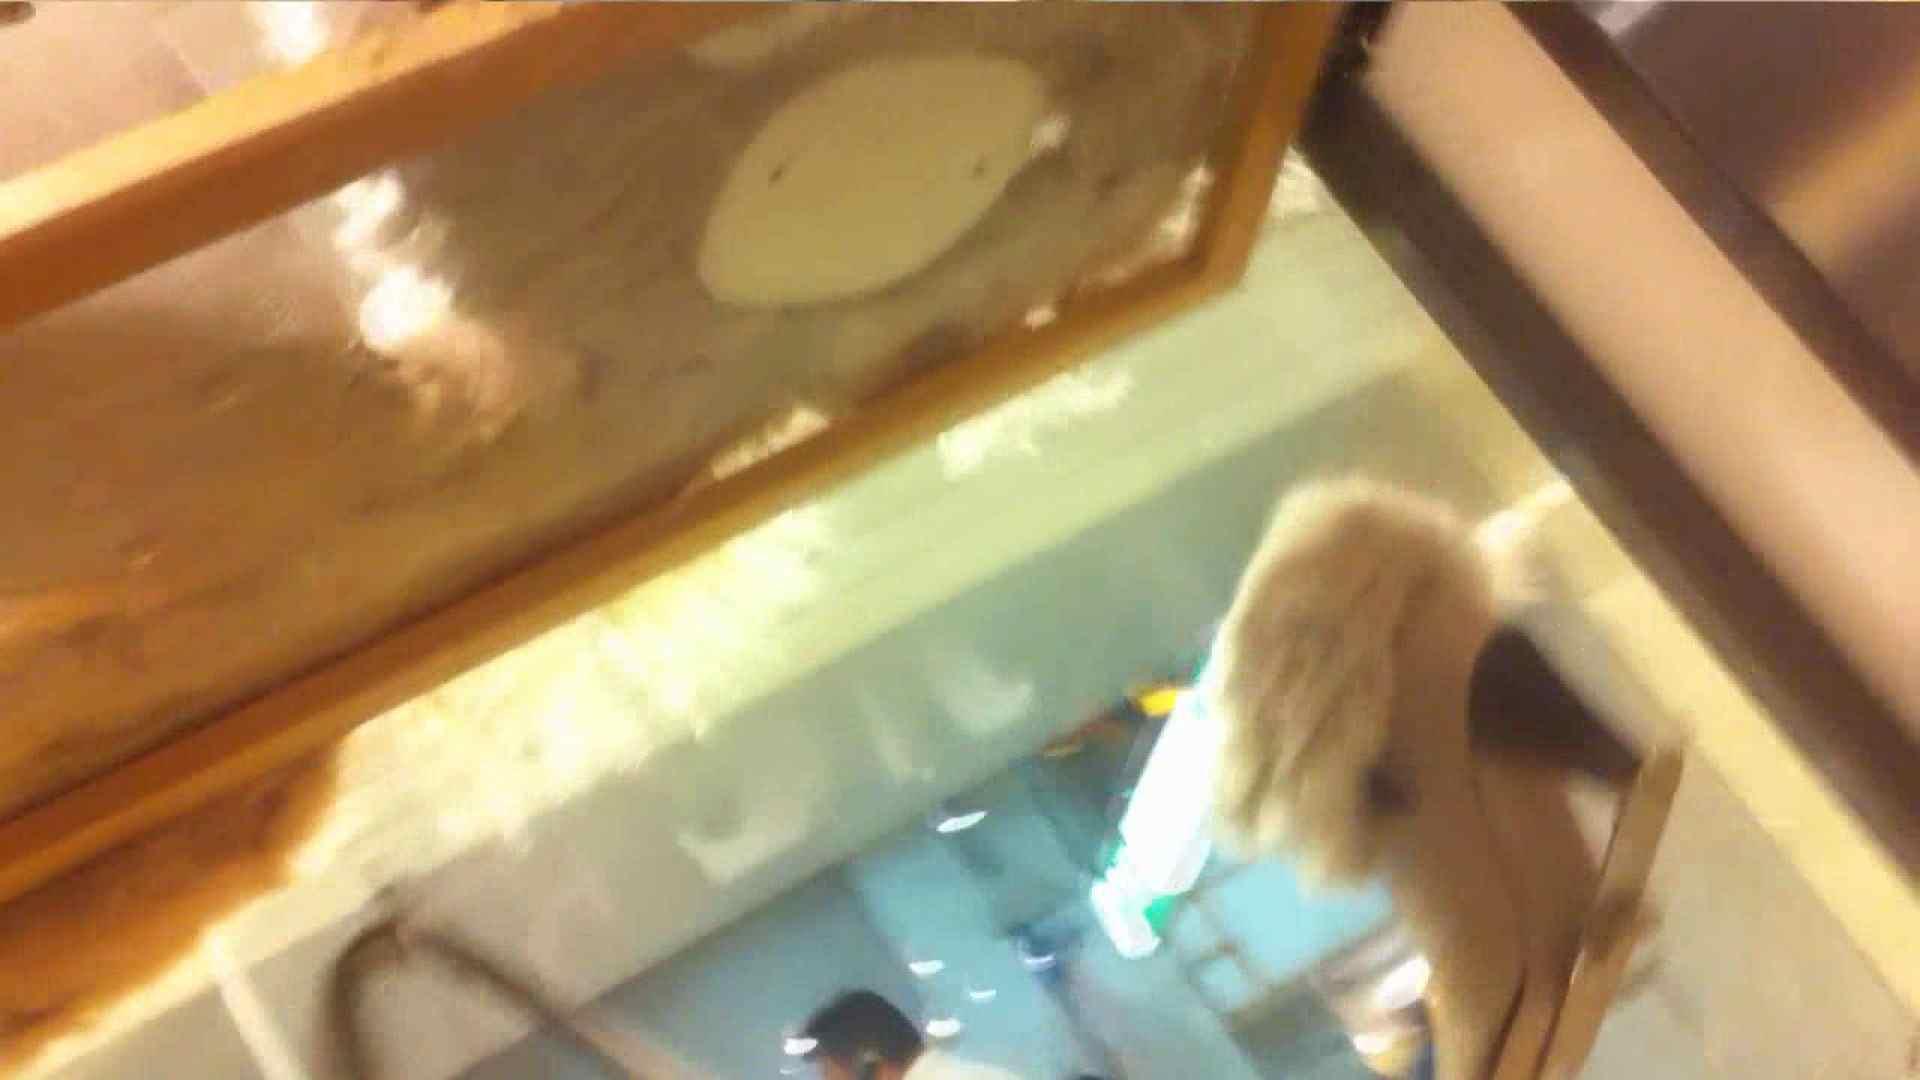 vol.34 美人アパレル胸チラ&パンチラ メガネ属性っていいよね♥ 0 | 0  35画像 29